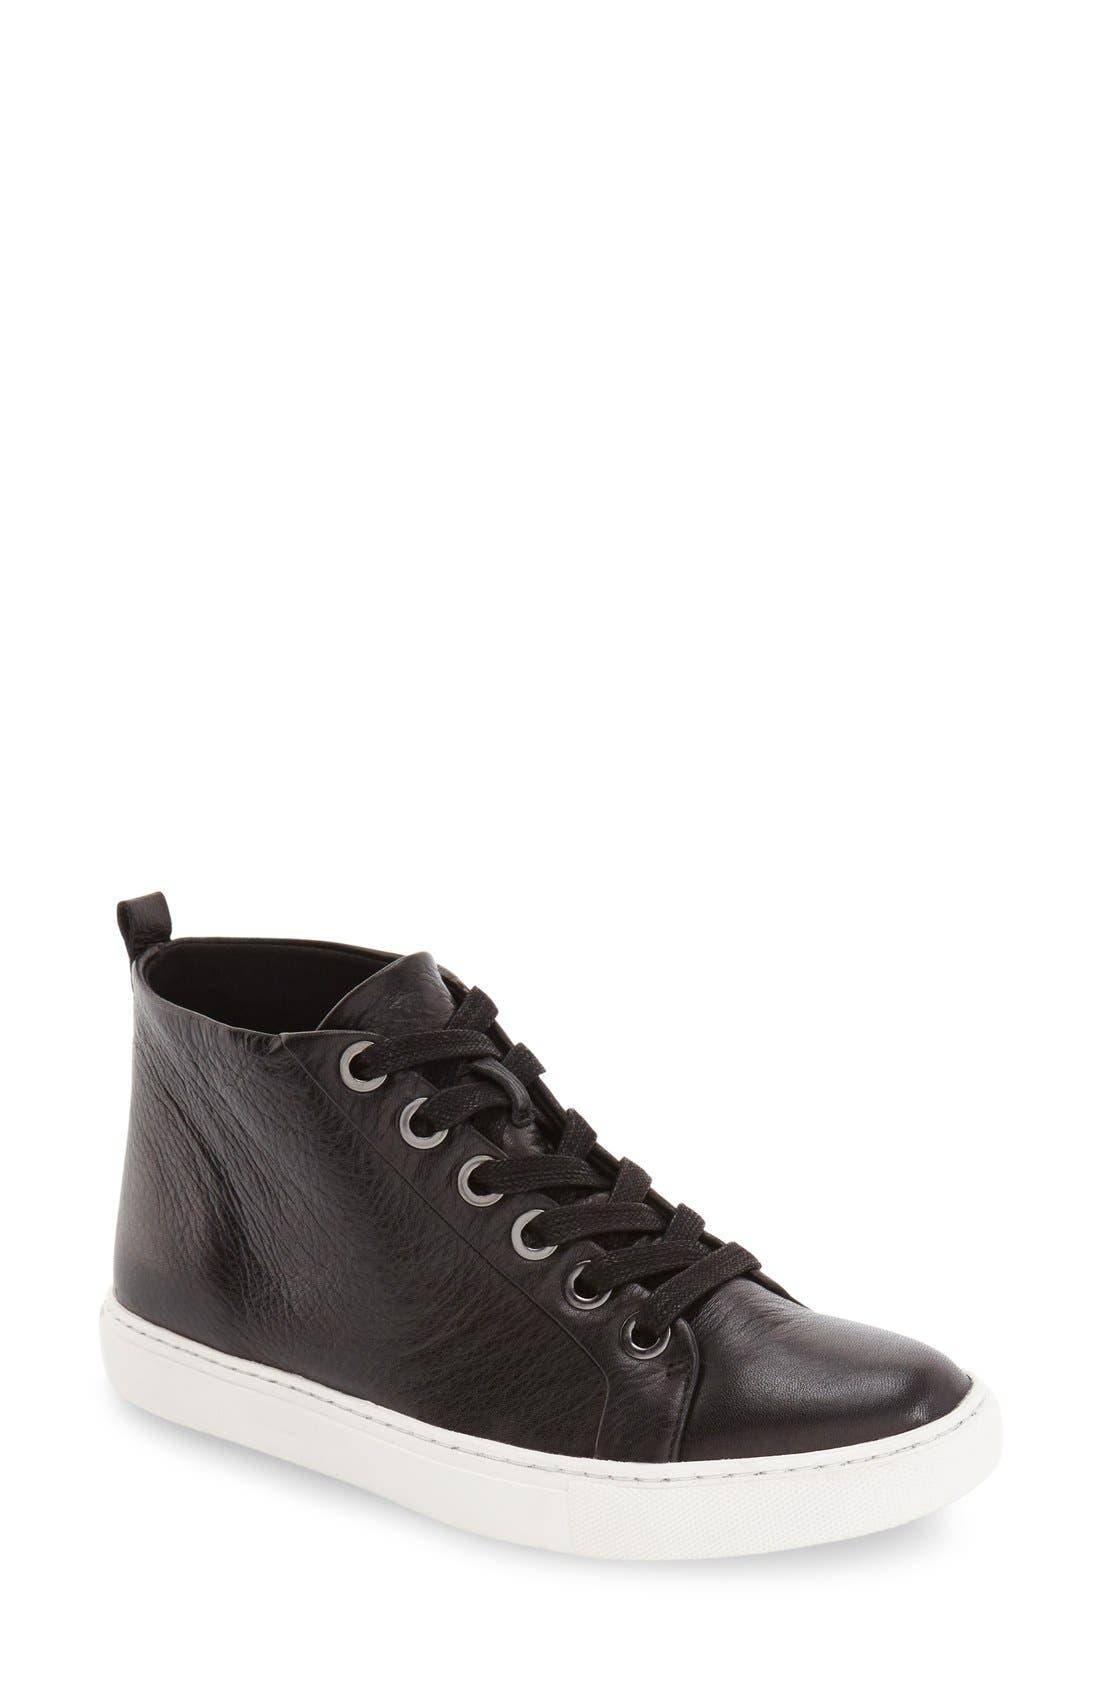 'Kaleb' High Top Sneaker,                             Main thumbnail 1, color,                             001